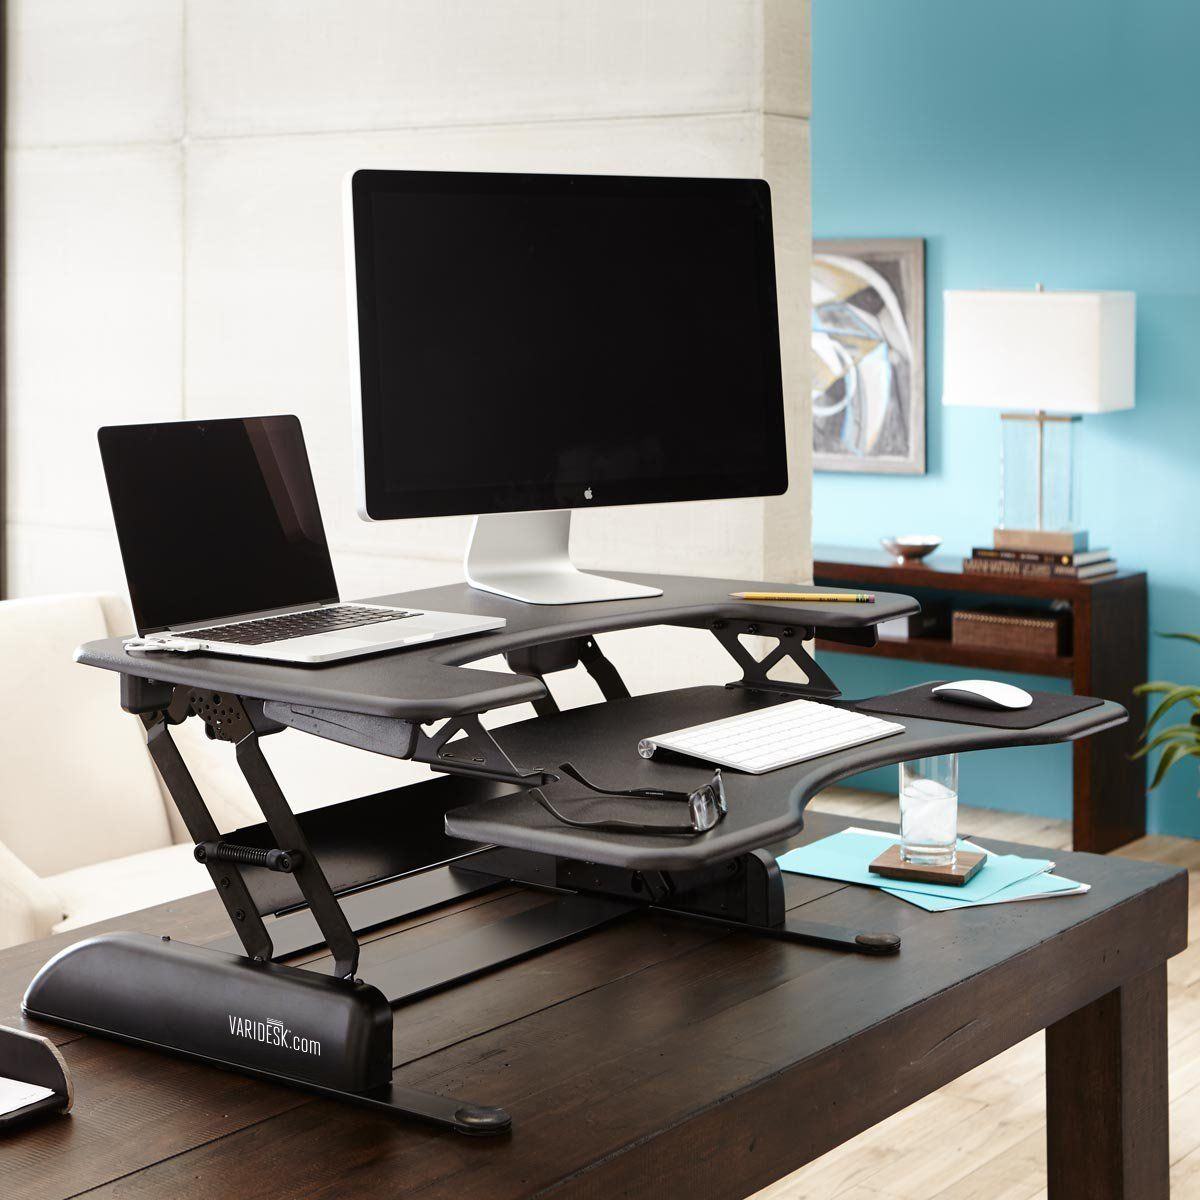 Amazon Com Height Adjustable Standing Desk Varidesk Pro Plus 36 Black Office Products Adjustable Standing Desk Standing Desk Converter Standing Desk